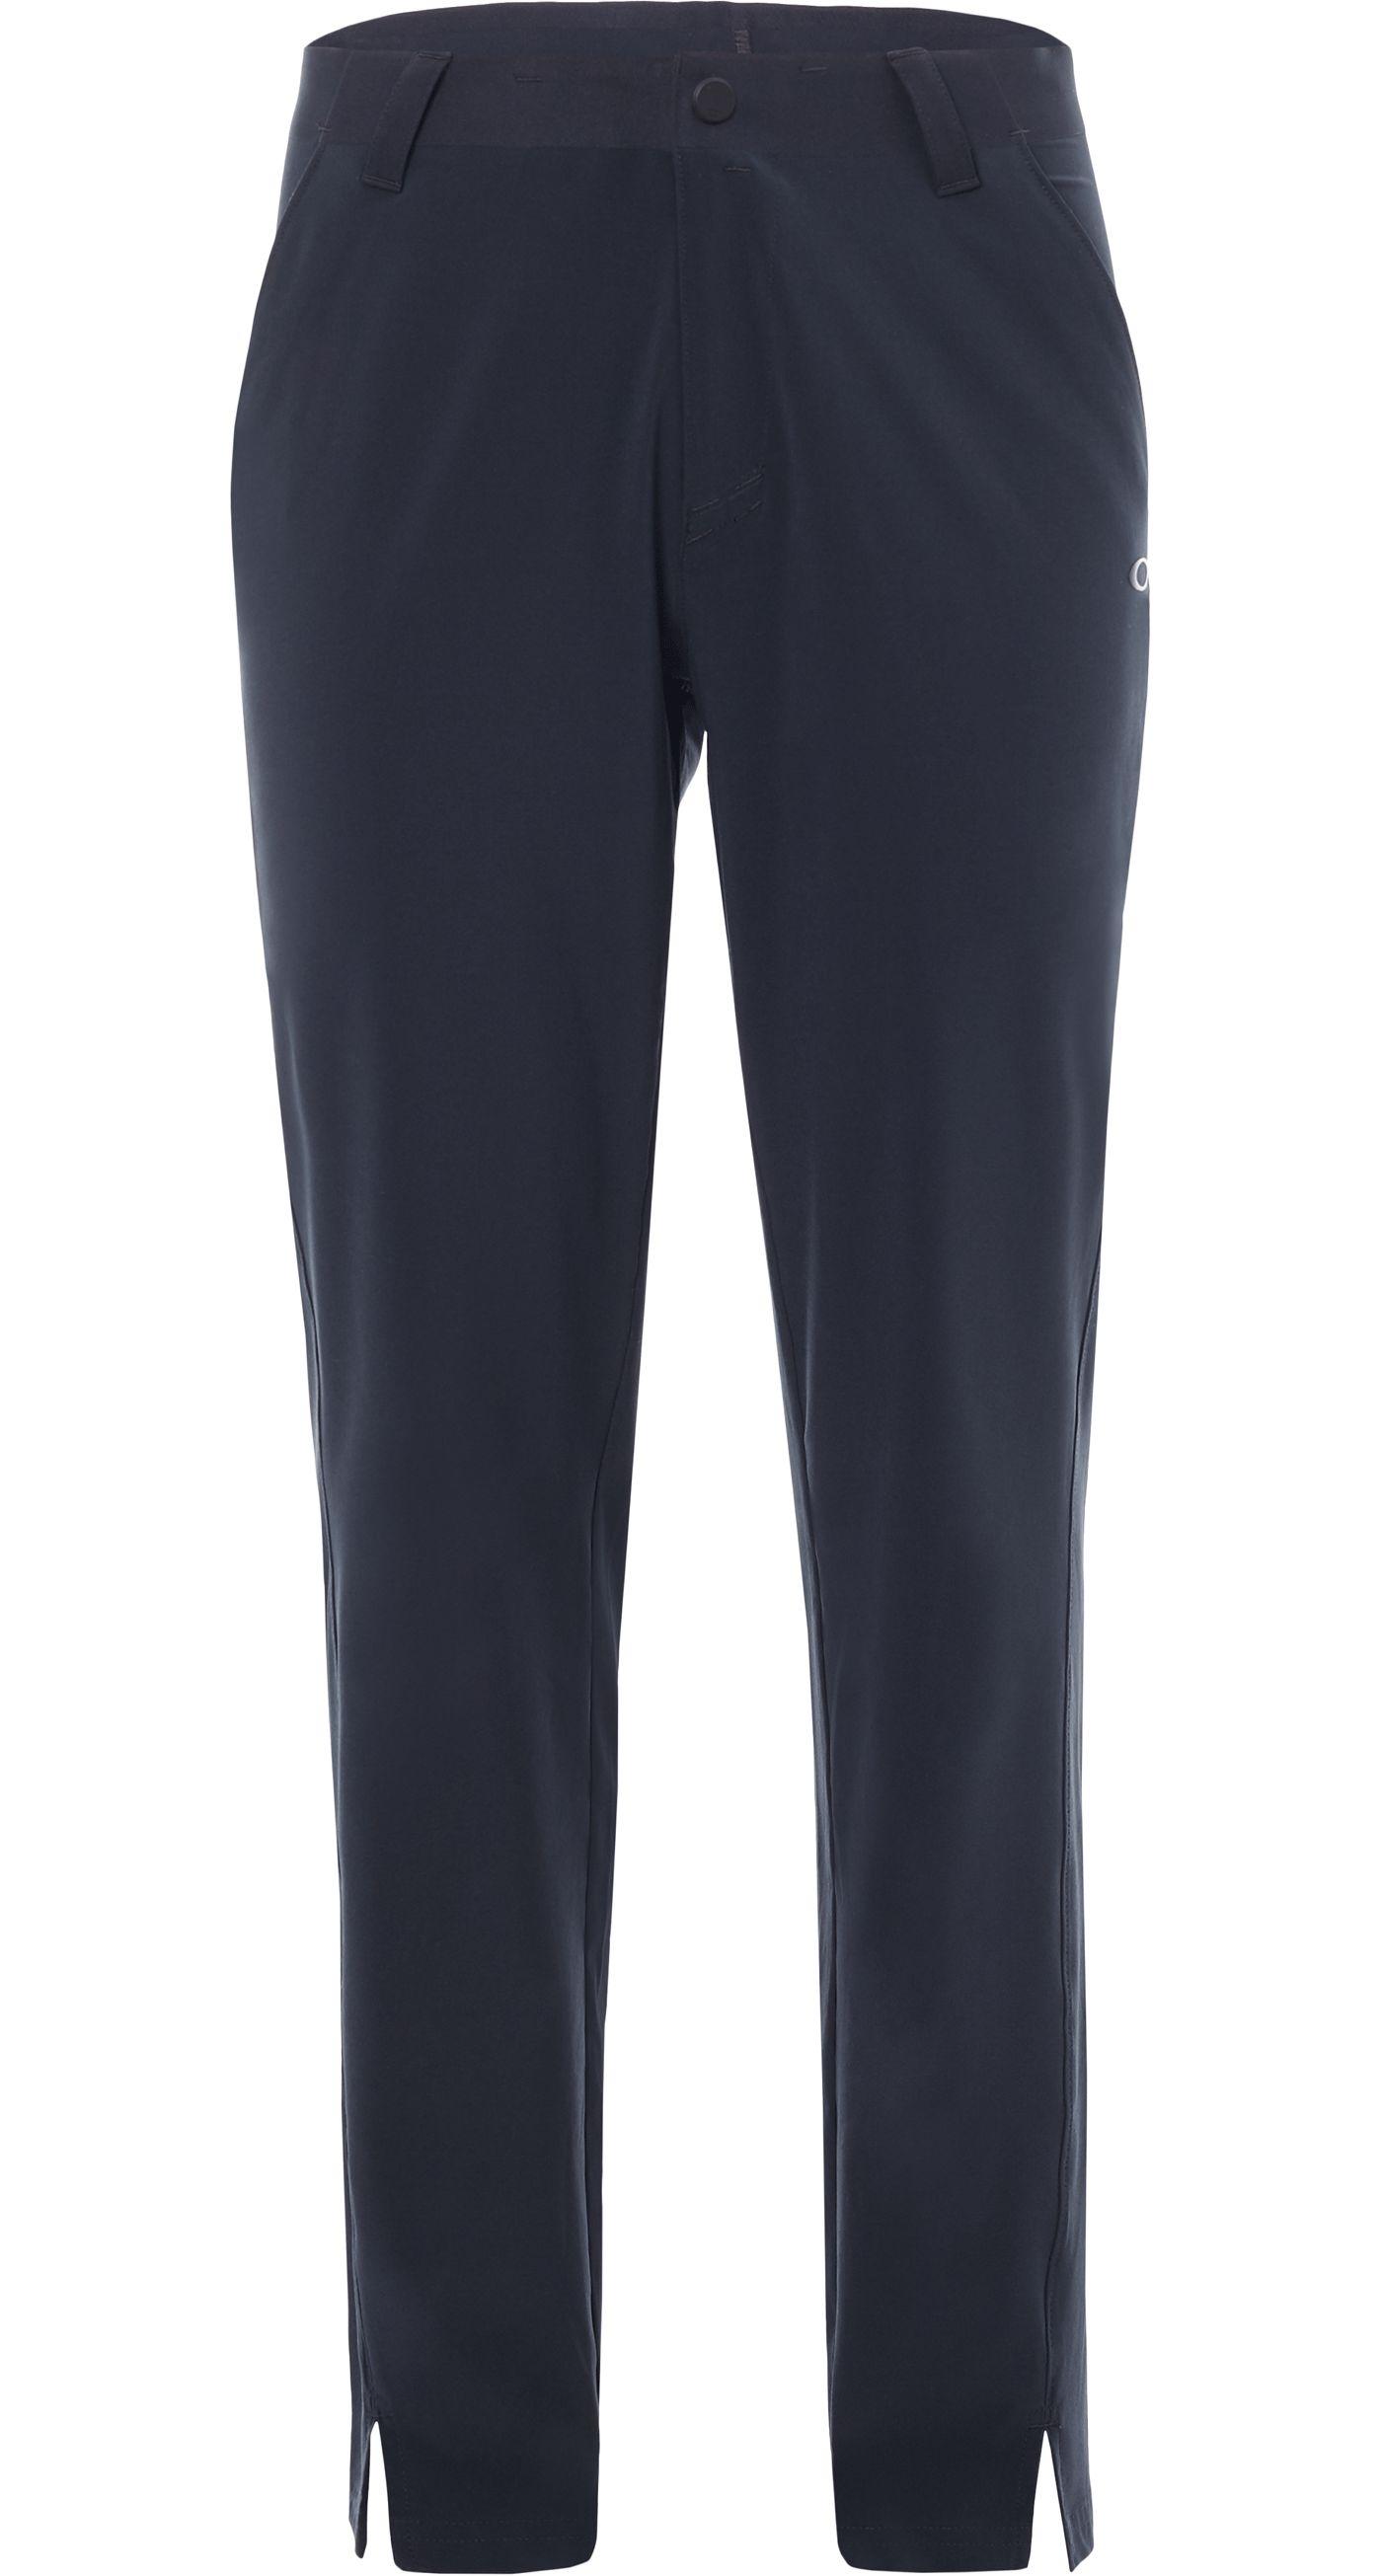 Oakley Men's Velocity Golf Pants